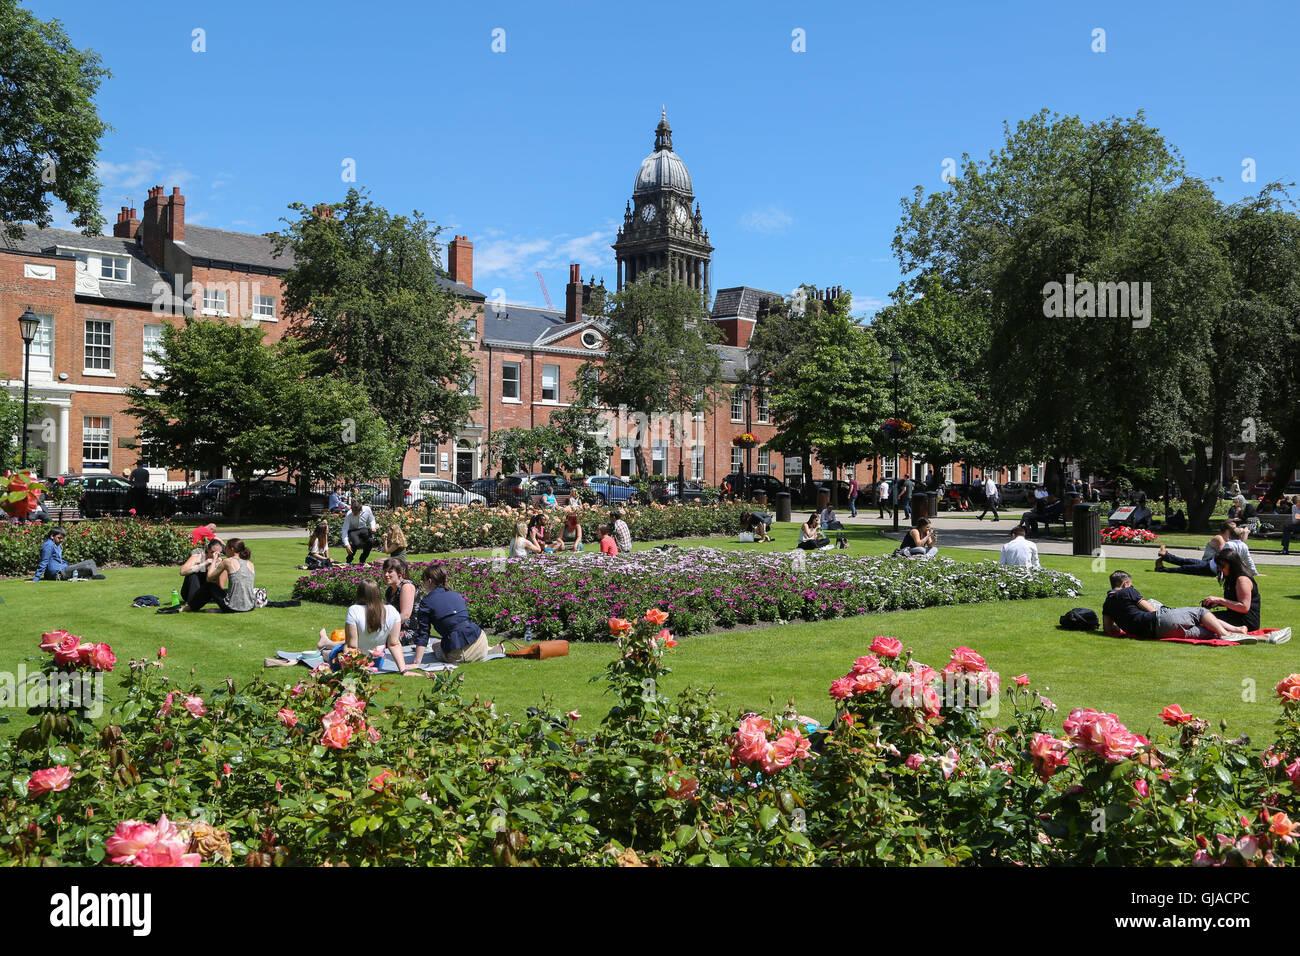 Leeds Town Hall - Tickets.com